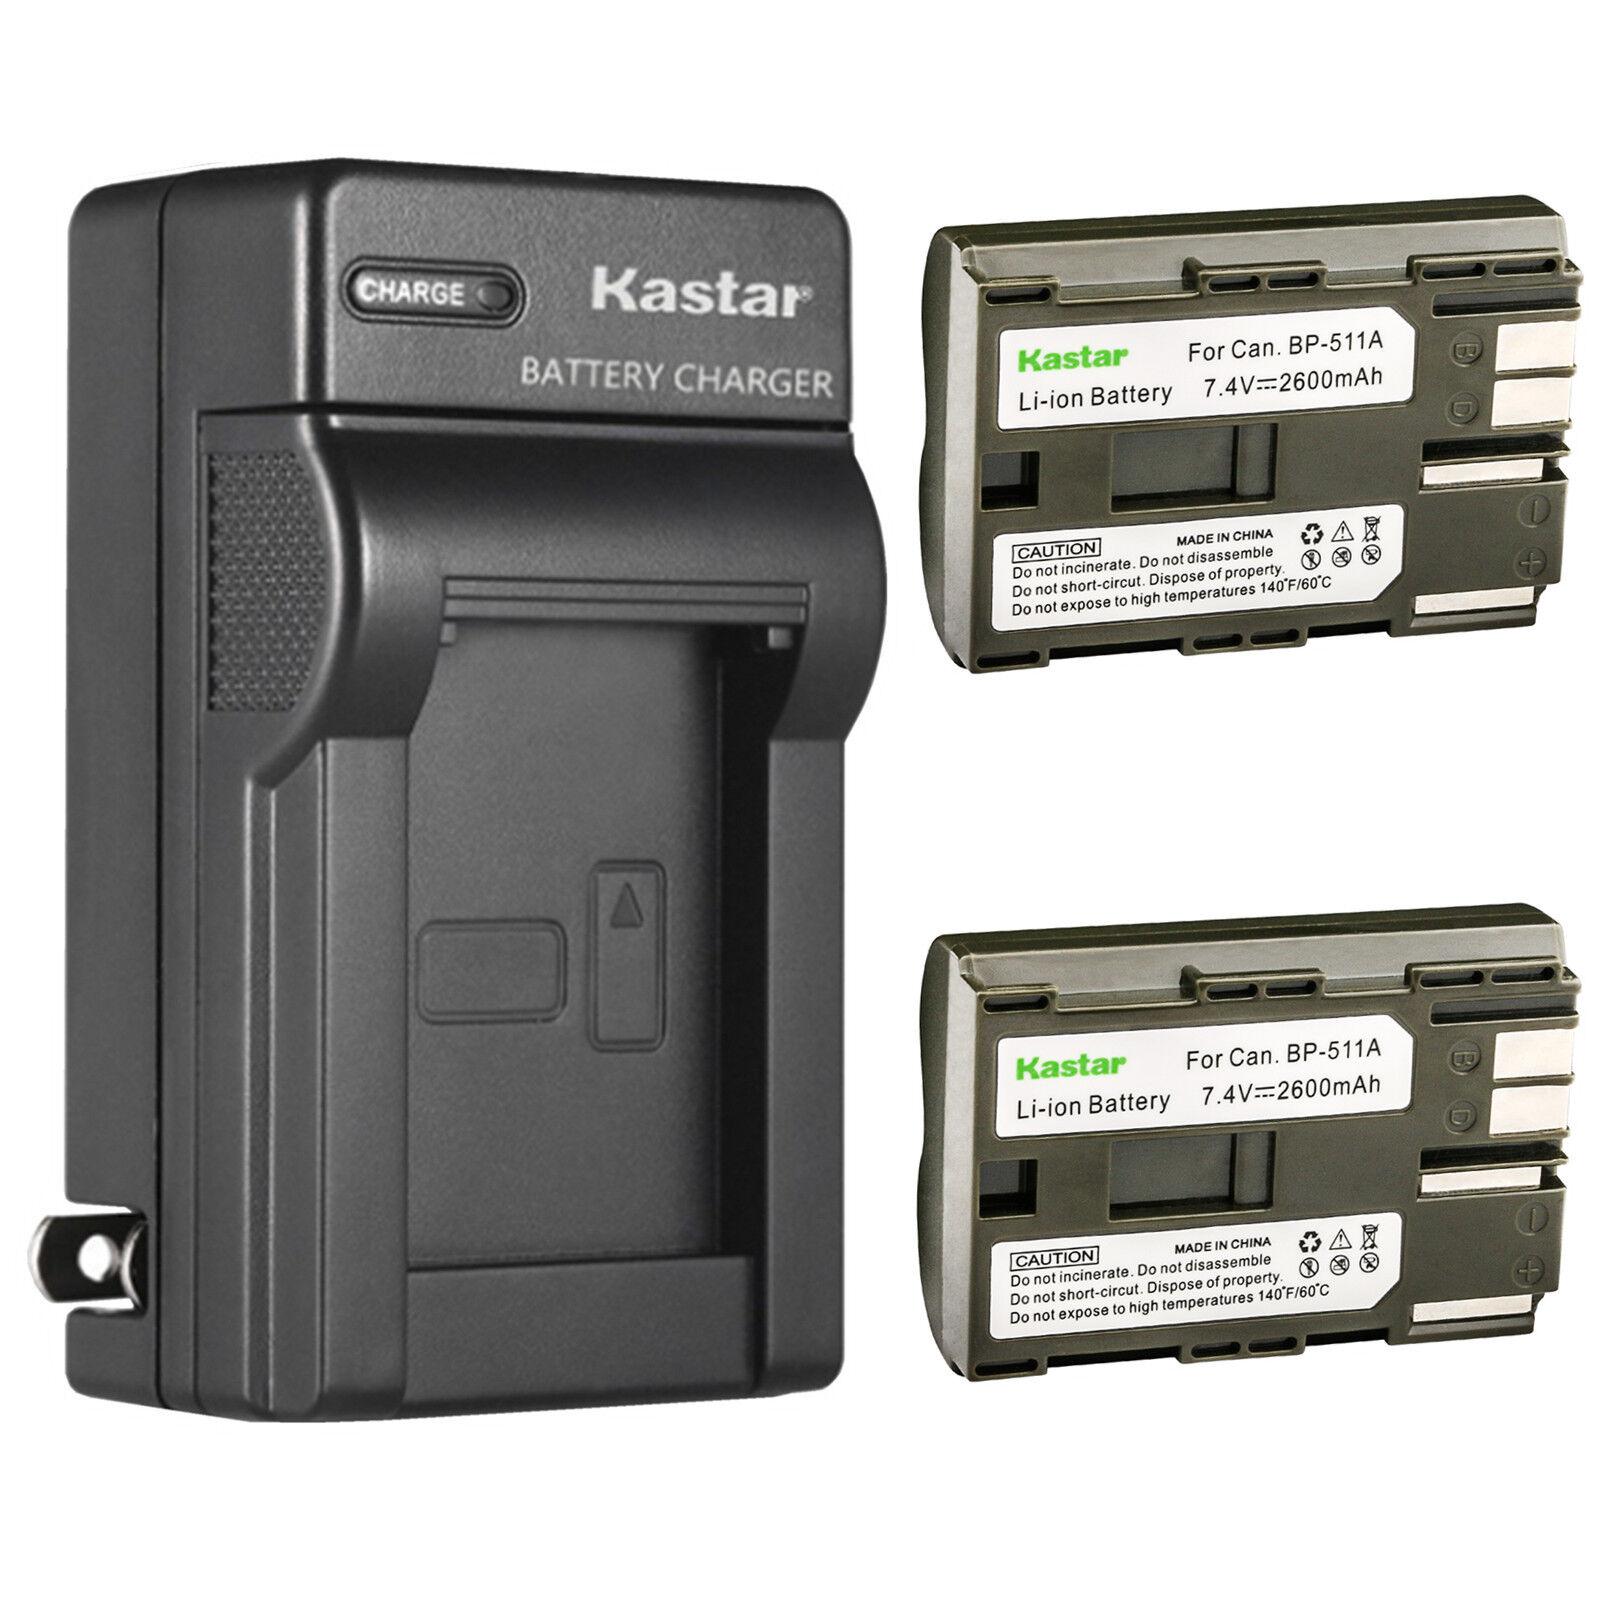 10D G1 20D G2 Digital Rebel 1D D60 300D Pro90 etc. G3 Kastar Travel Charger for Canon BP-511 BP-511A Pro 1 40D 30D BP511 50D BP511A and Canon EOS 5D D30 G6 Kiss Powershot G5